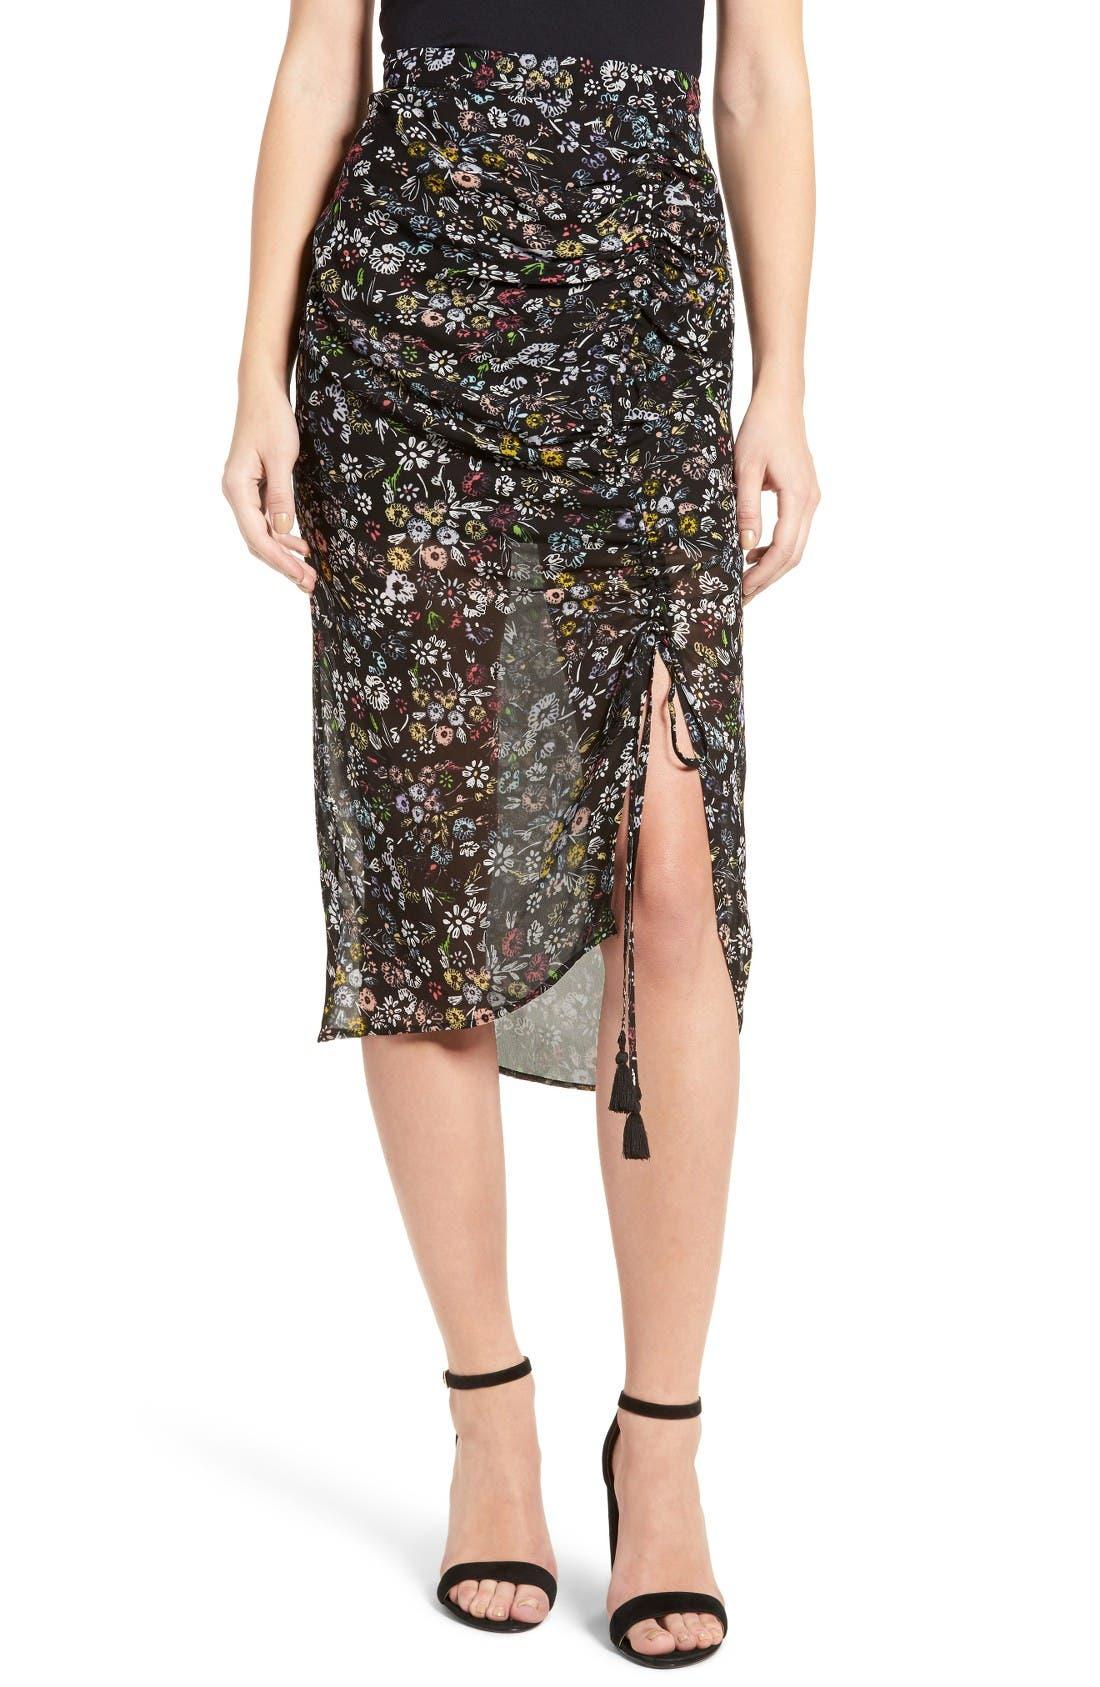 Rebecca Minkoff Romy Floral Print Skirt